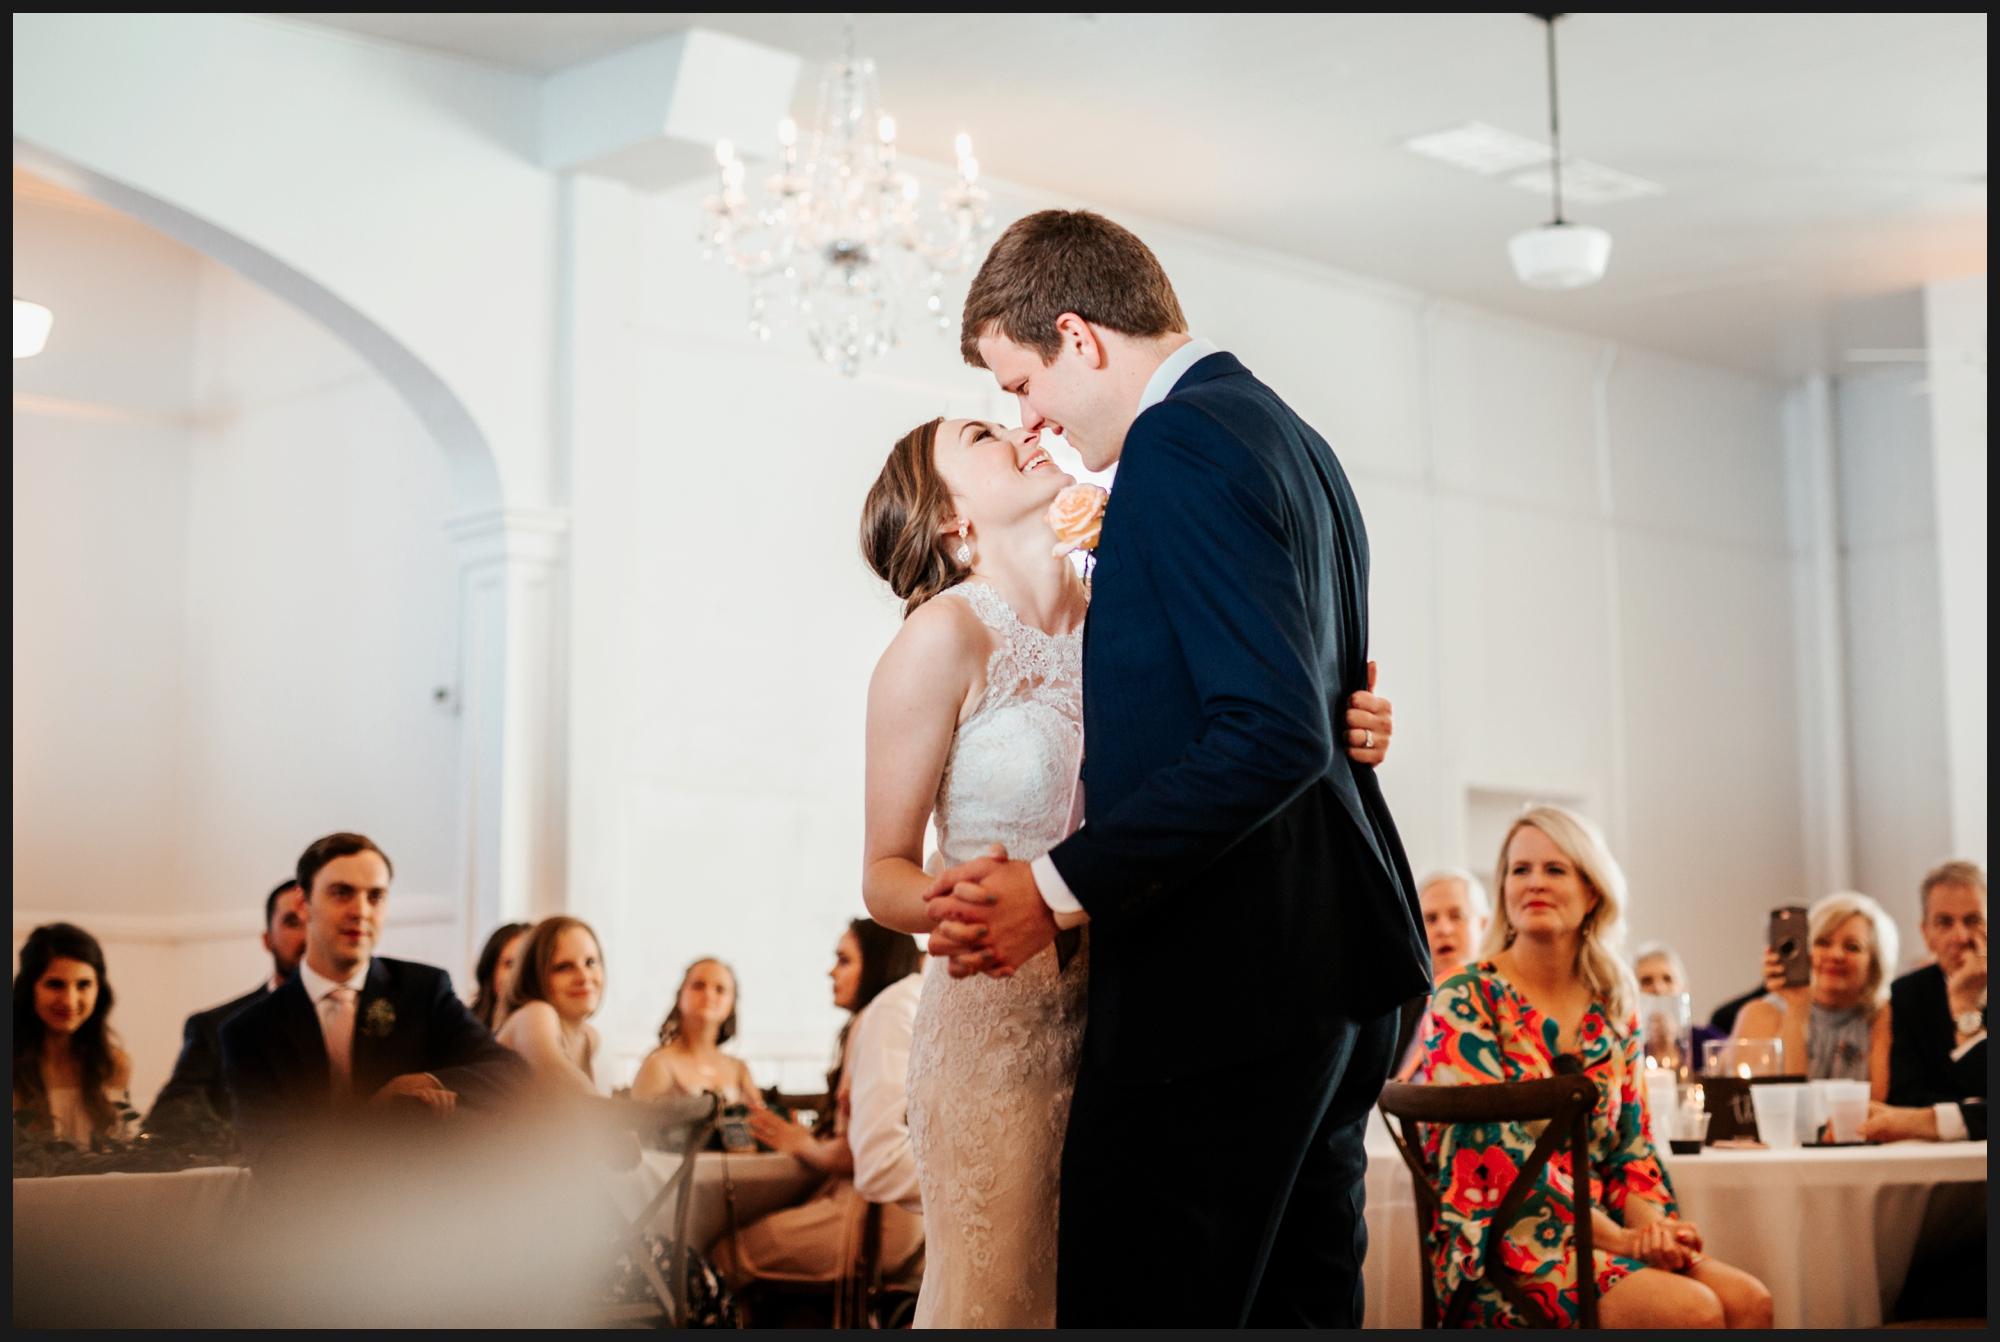 Orlando-Wedding-Photographer-destination-wedding-photographer-florida-wedding-photographer-bohemian-wedding-photographer_1774.jpg